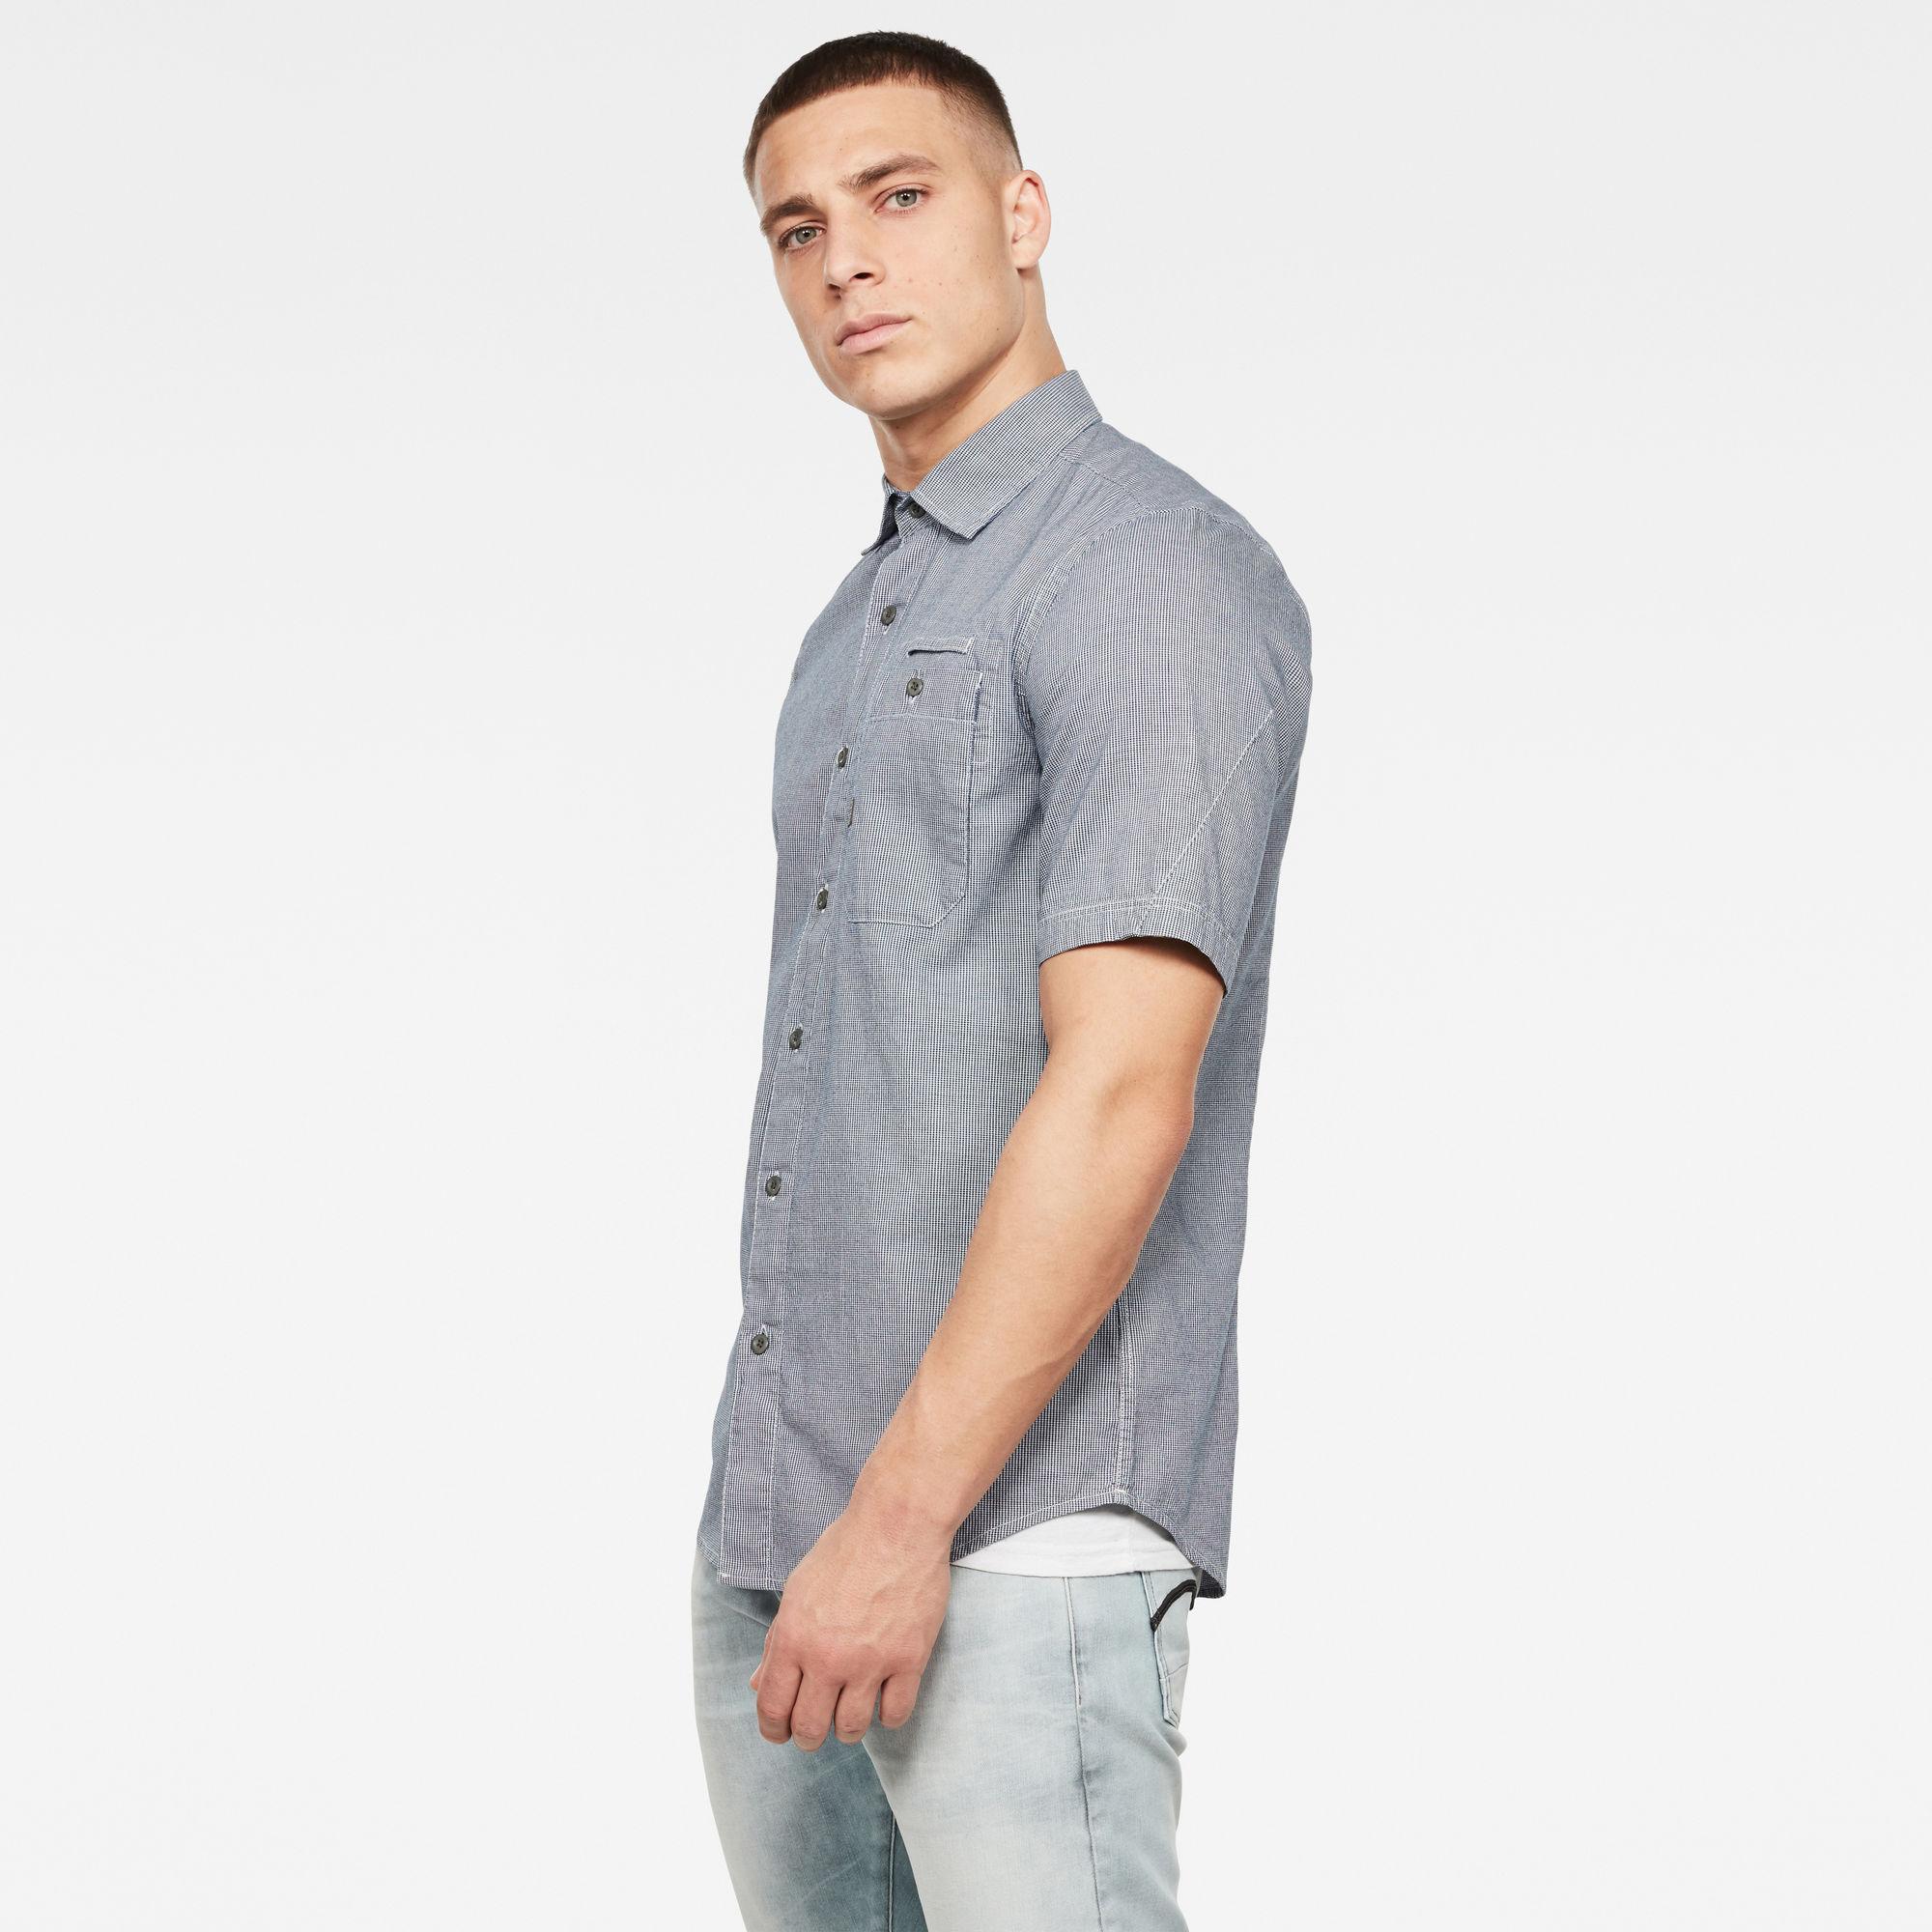 Bristum 1-Pocket Slim Overhemd